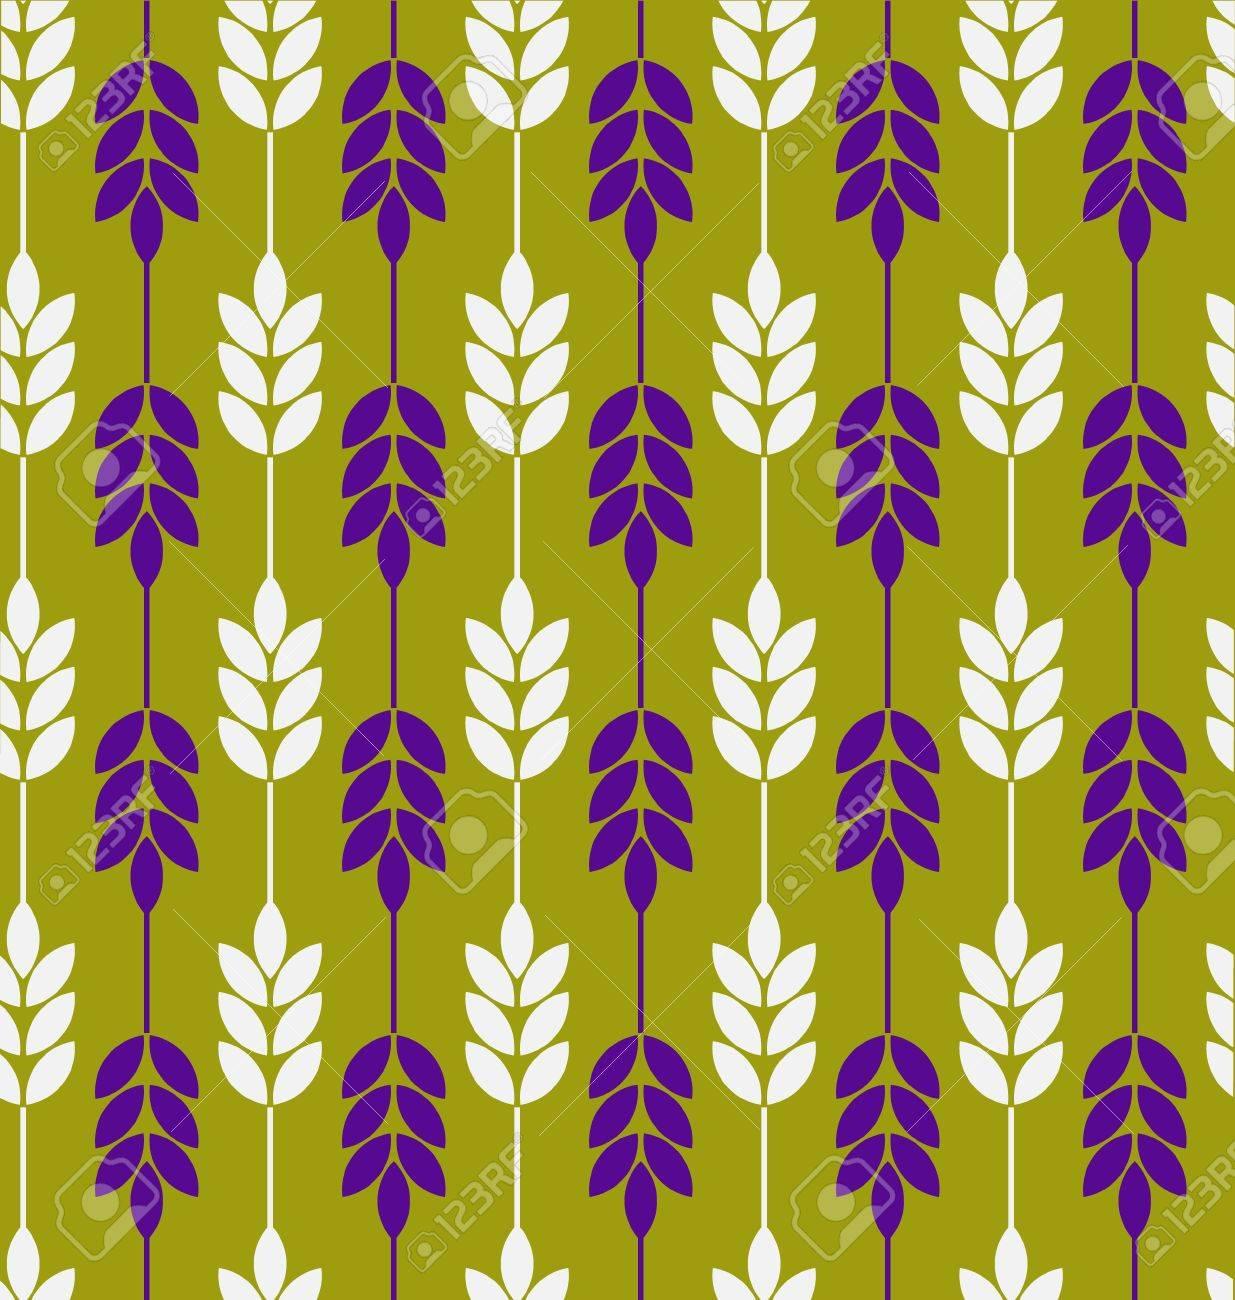 Seamless ornament  pattern vector tile for multipurpose use in design Stock Vector - 20901584